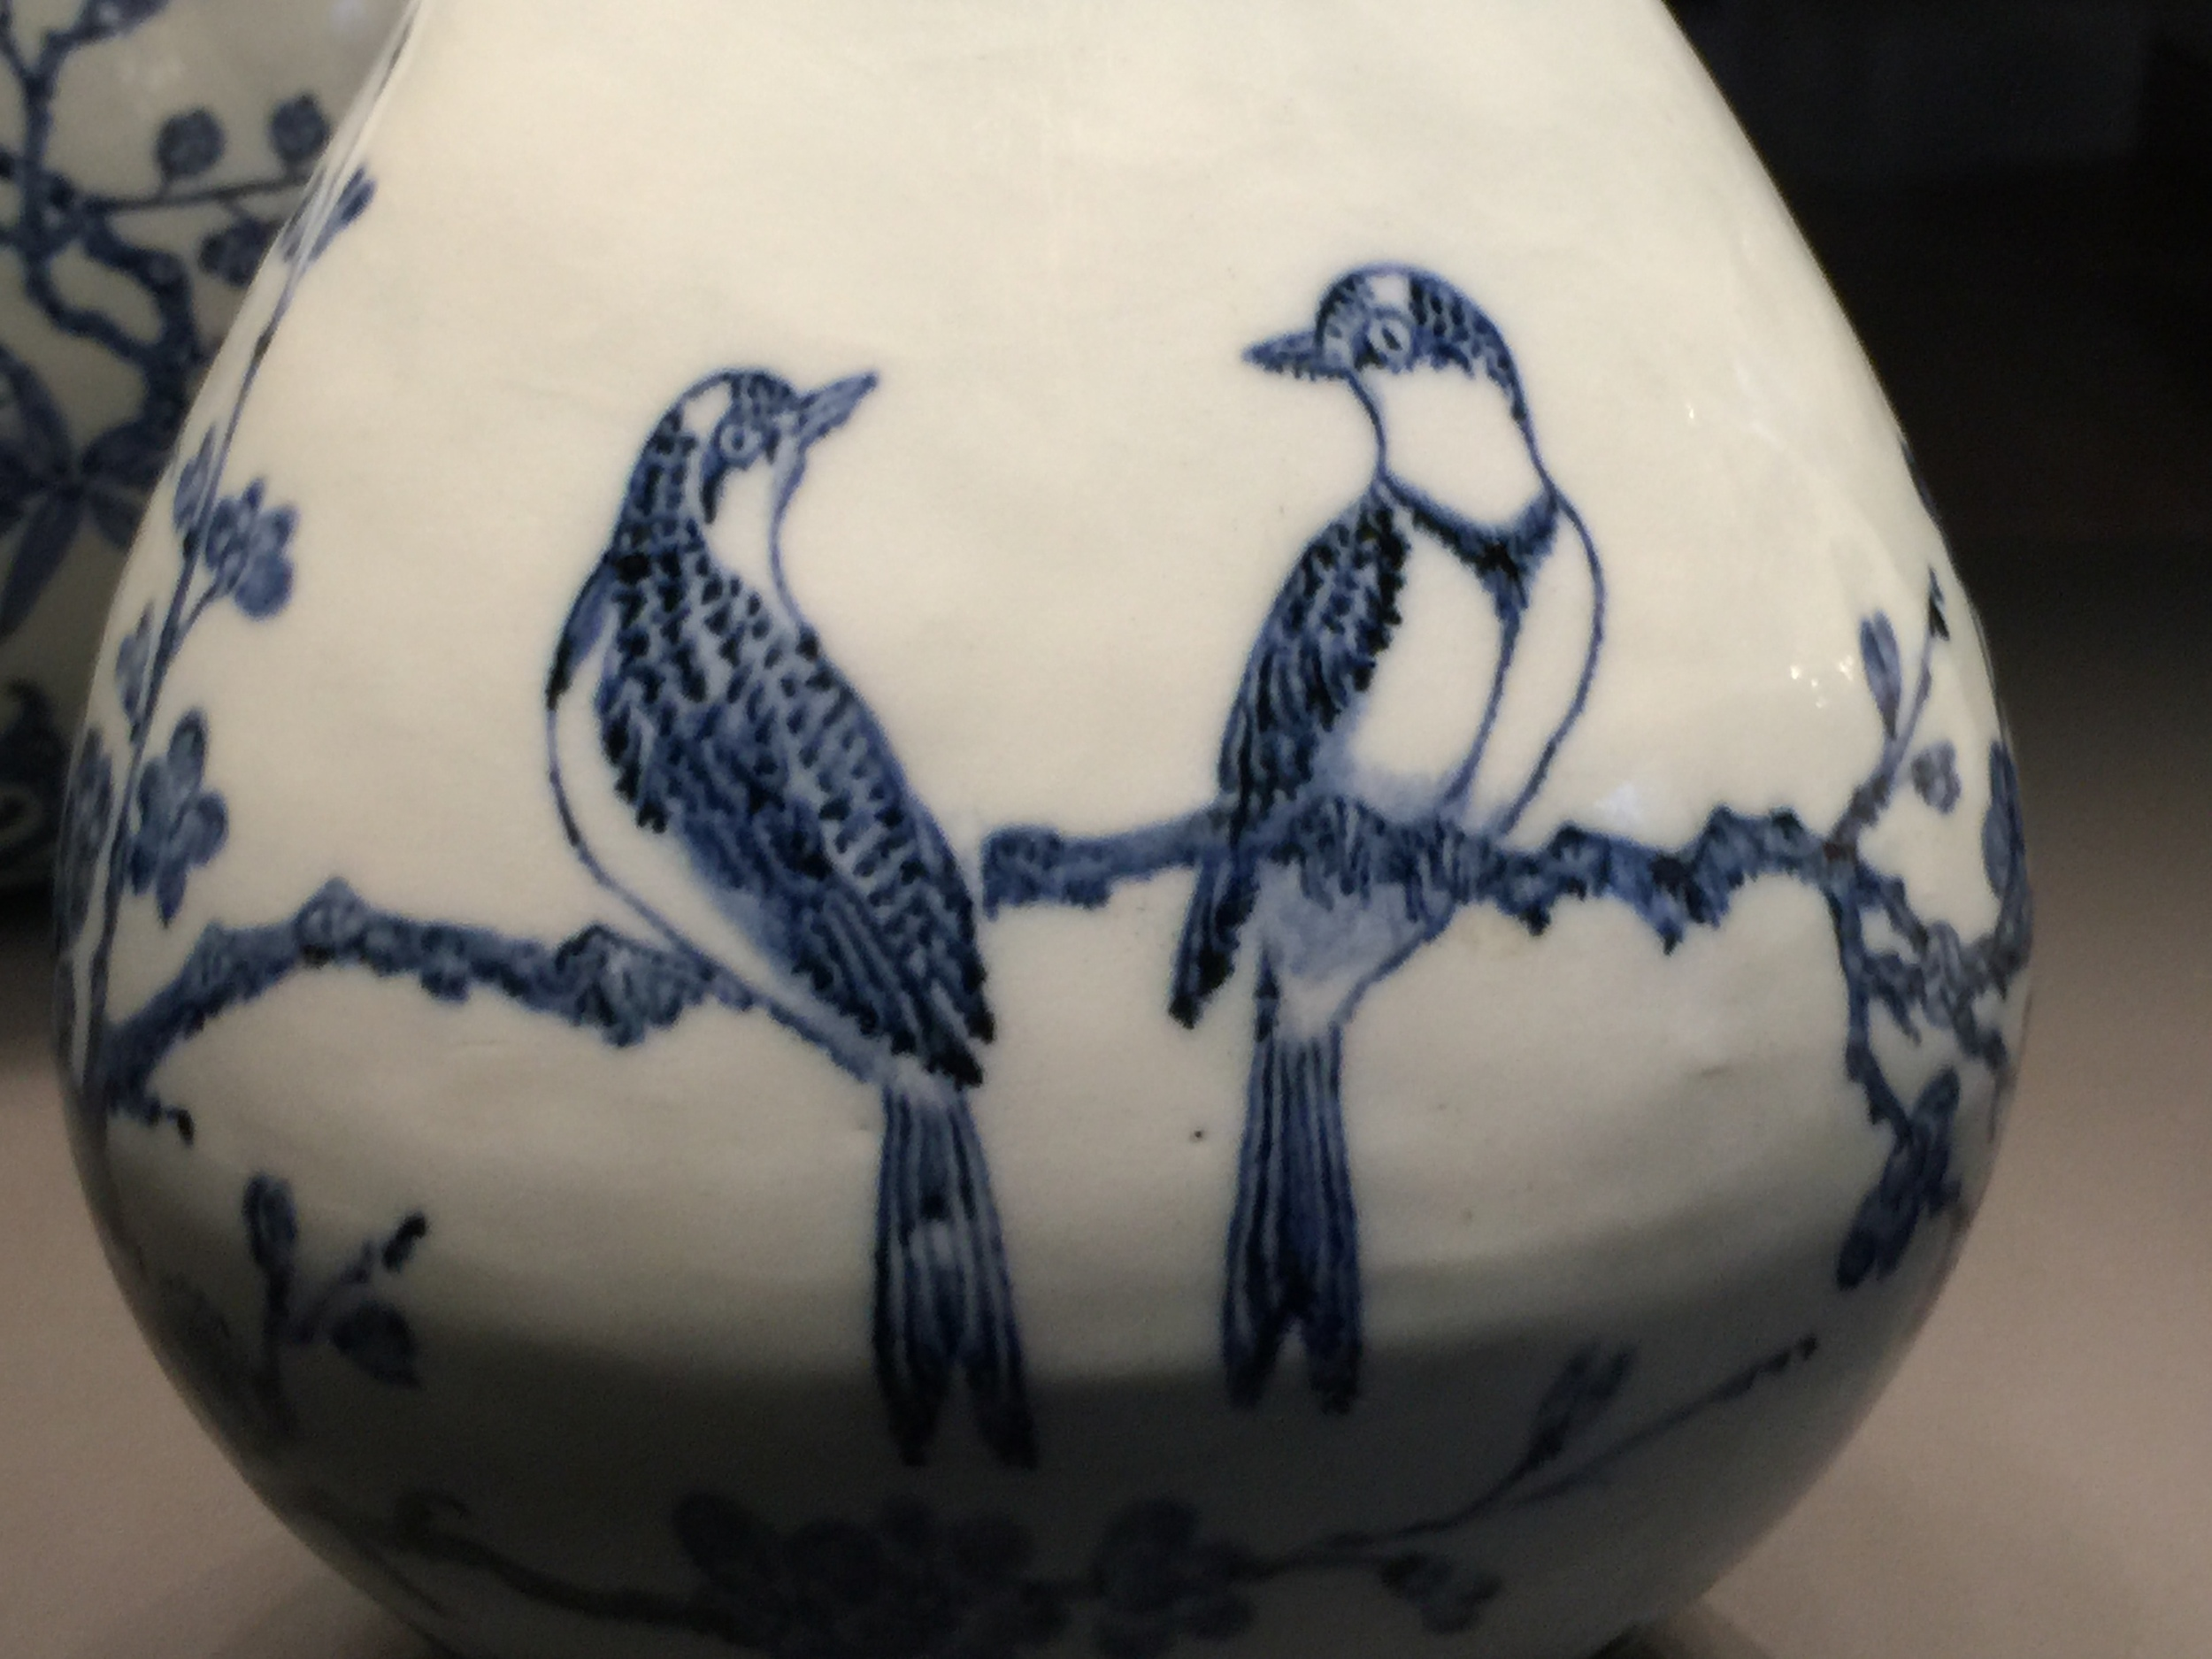 Chinese-Porcelain-British-Museum-Percival-David-jessewaugh.com-42.jpg